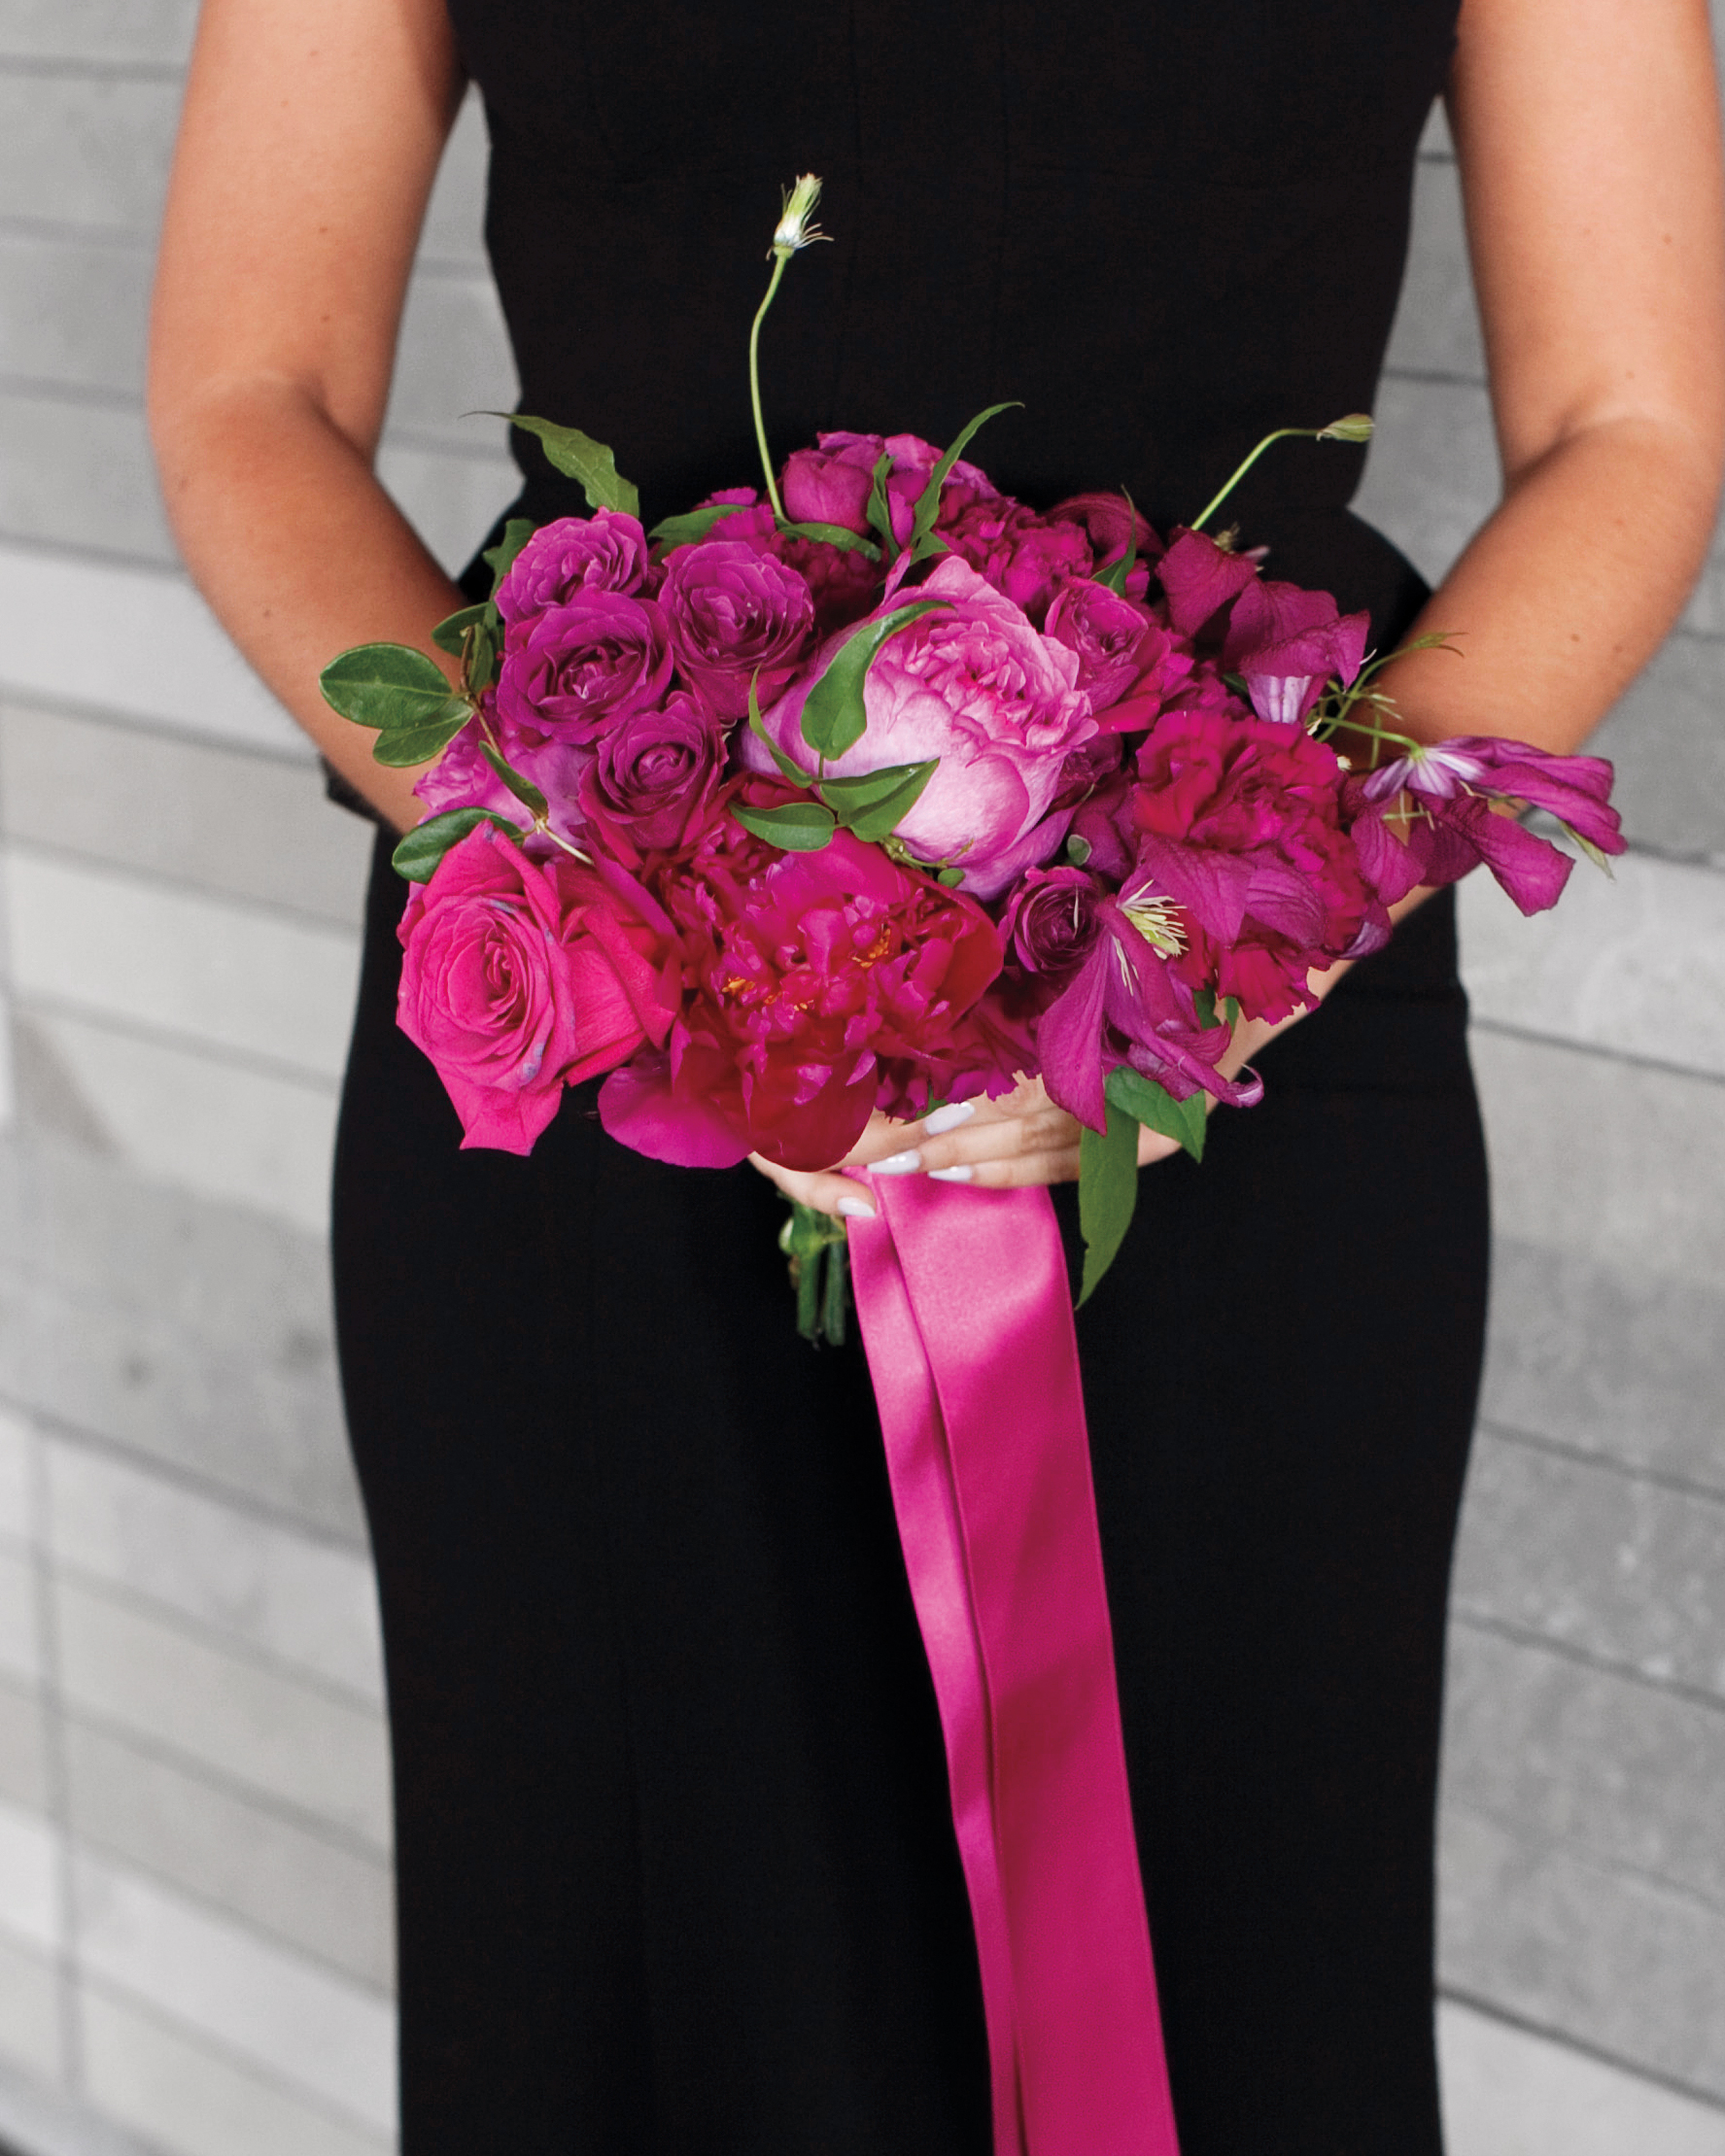 hanna-bret-bouquet-details-0097-s111676.jpg